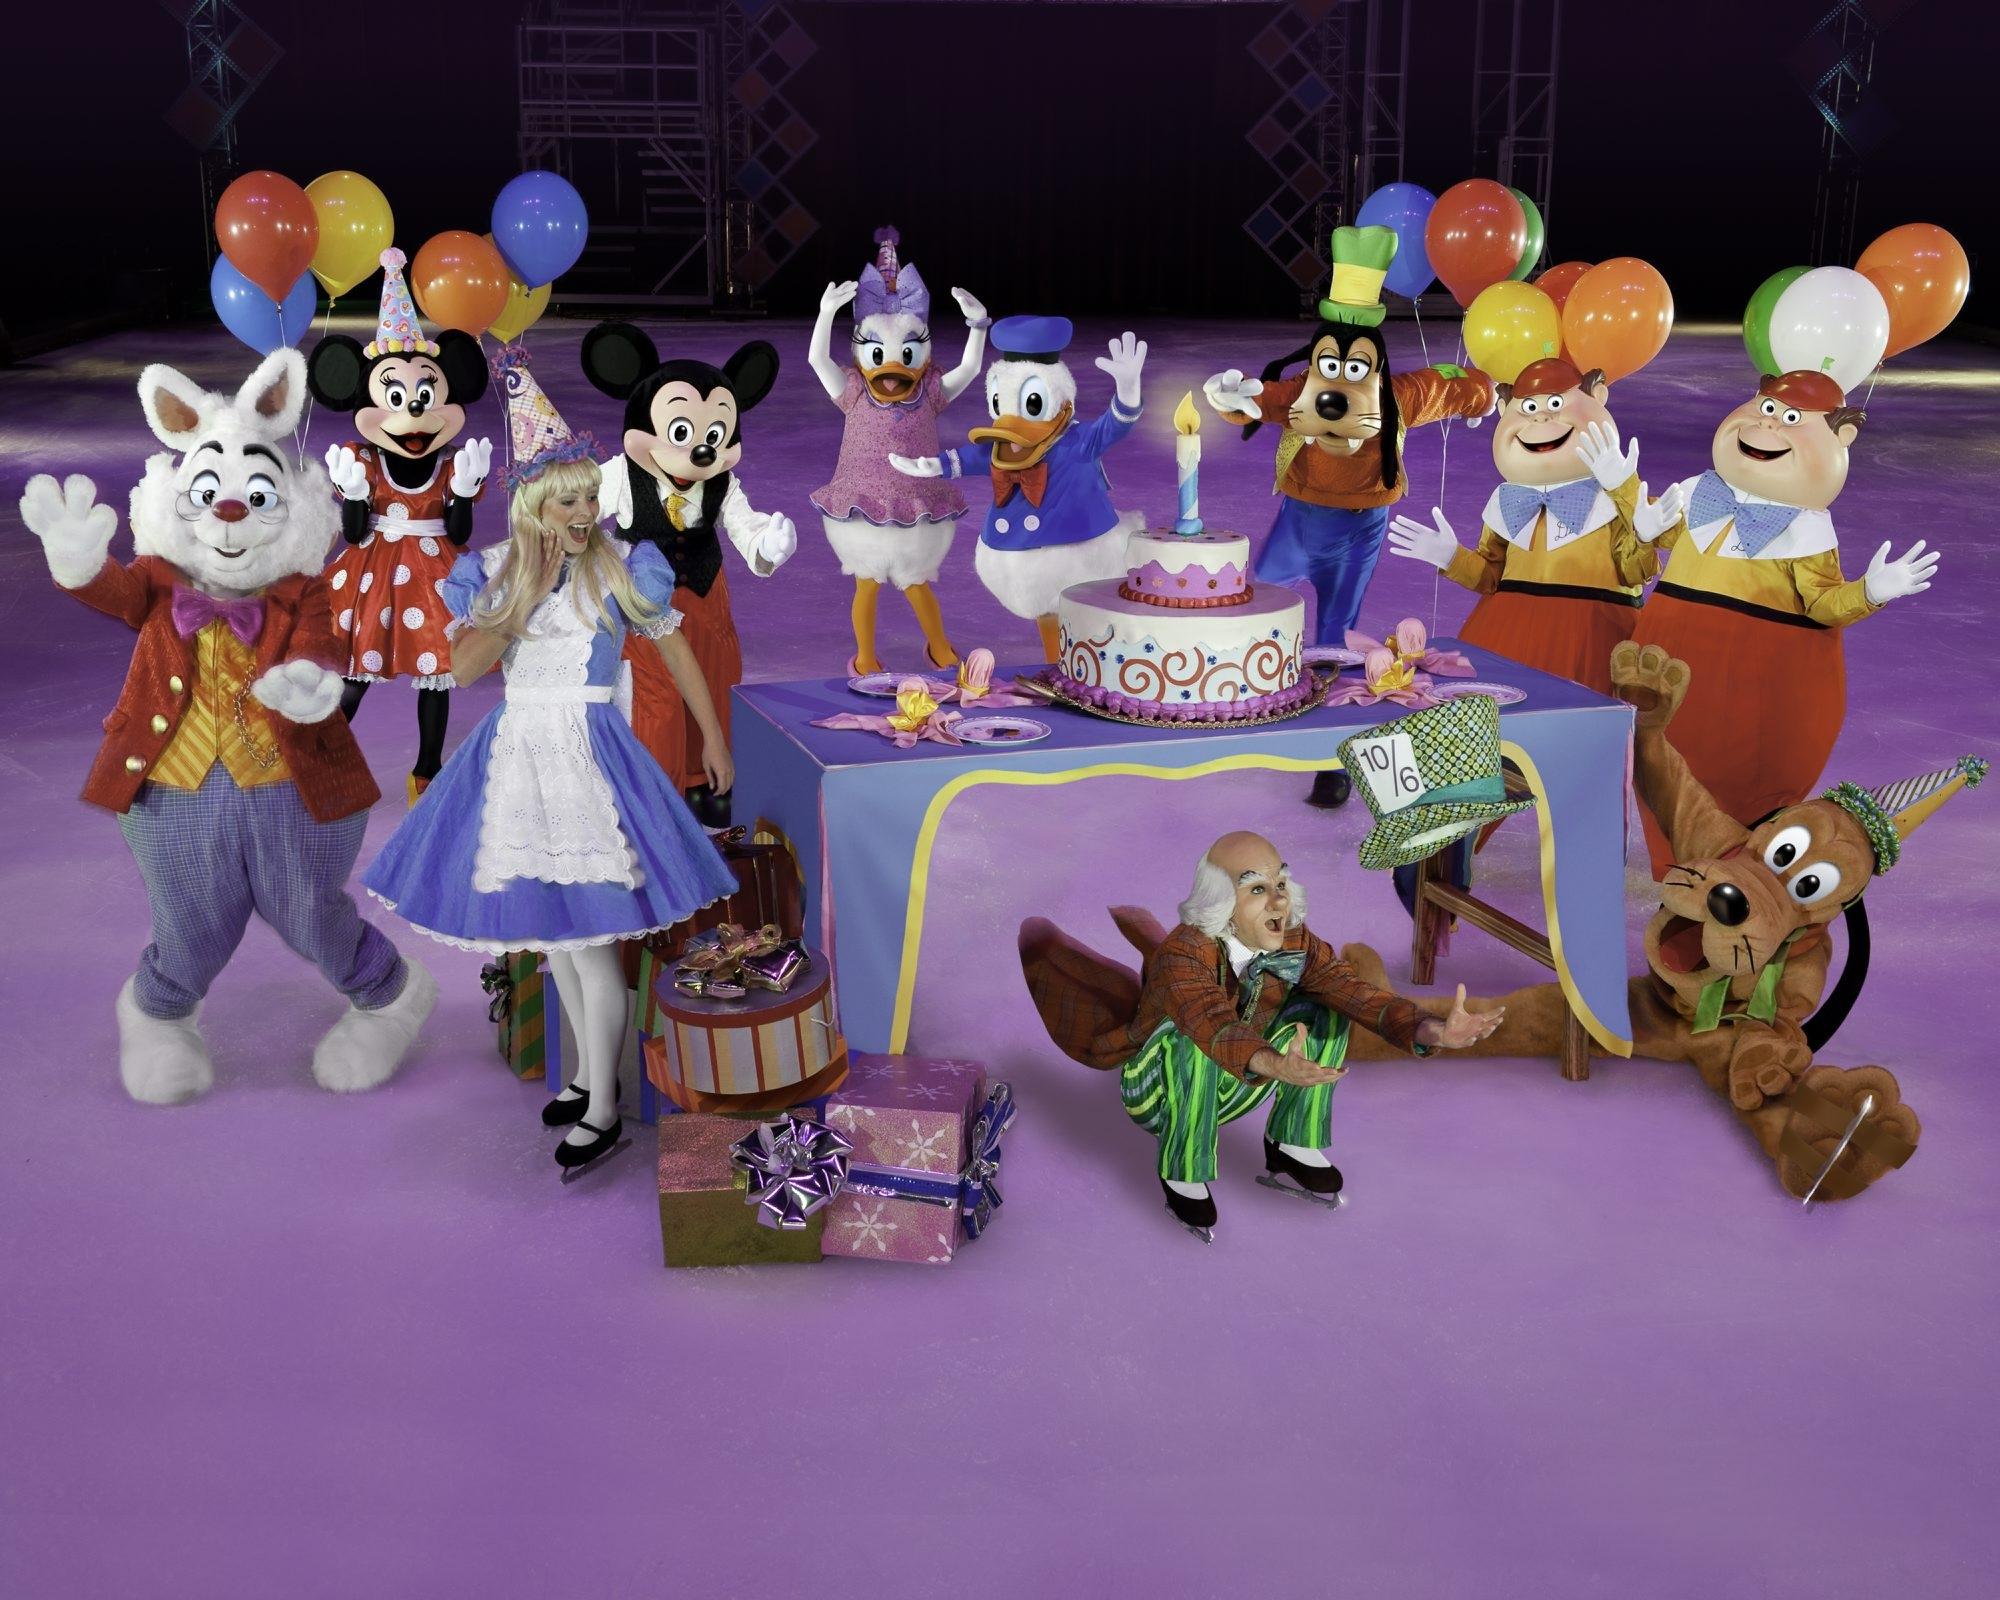 Alexis Darrow of Beamus Point stars as Alice in Wonderland in 'Disney on Ice presents Let's Celebrate.' (2015)